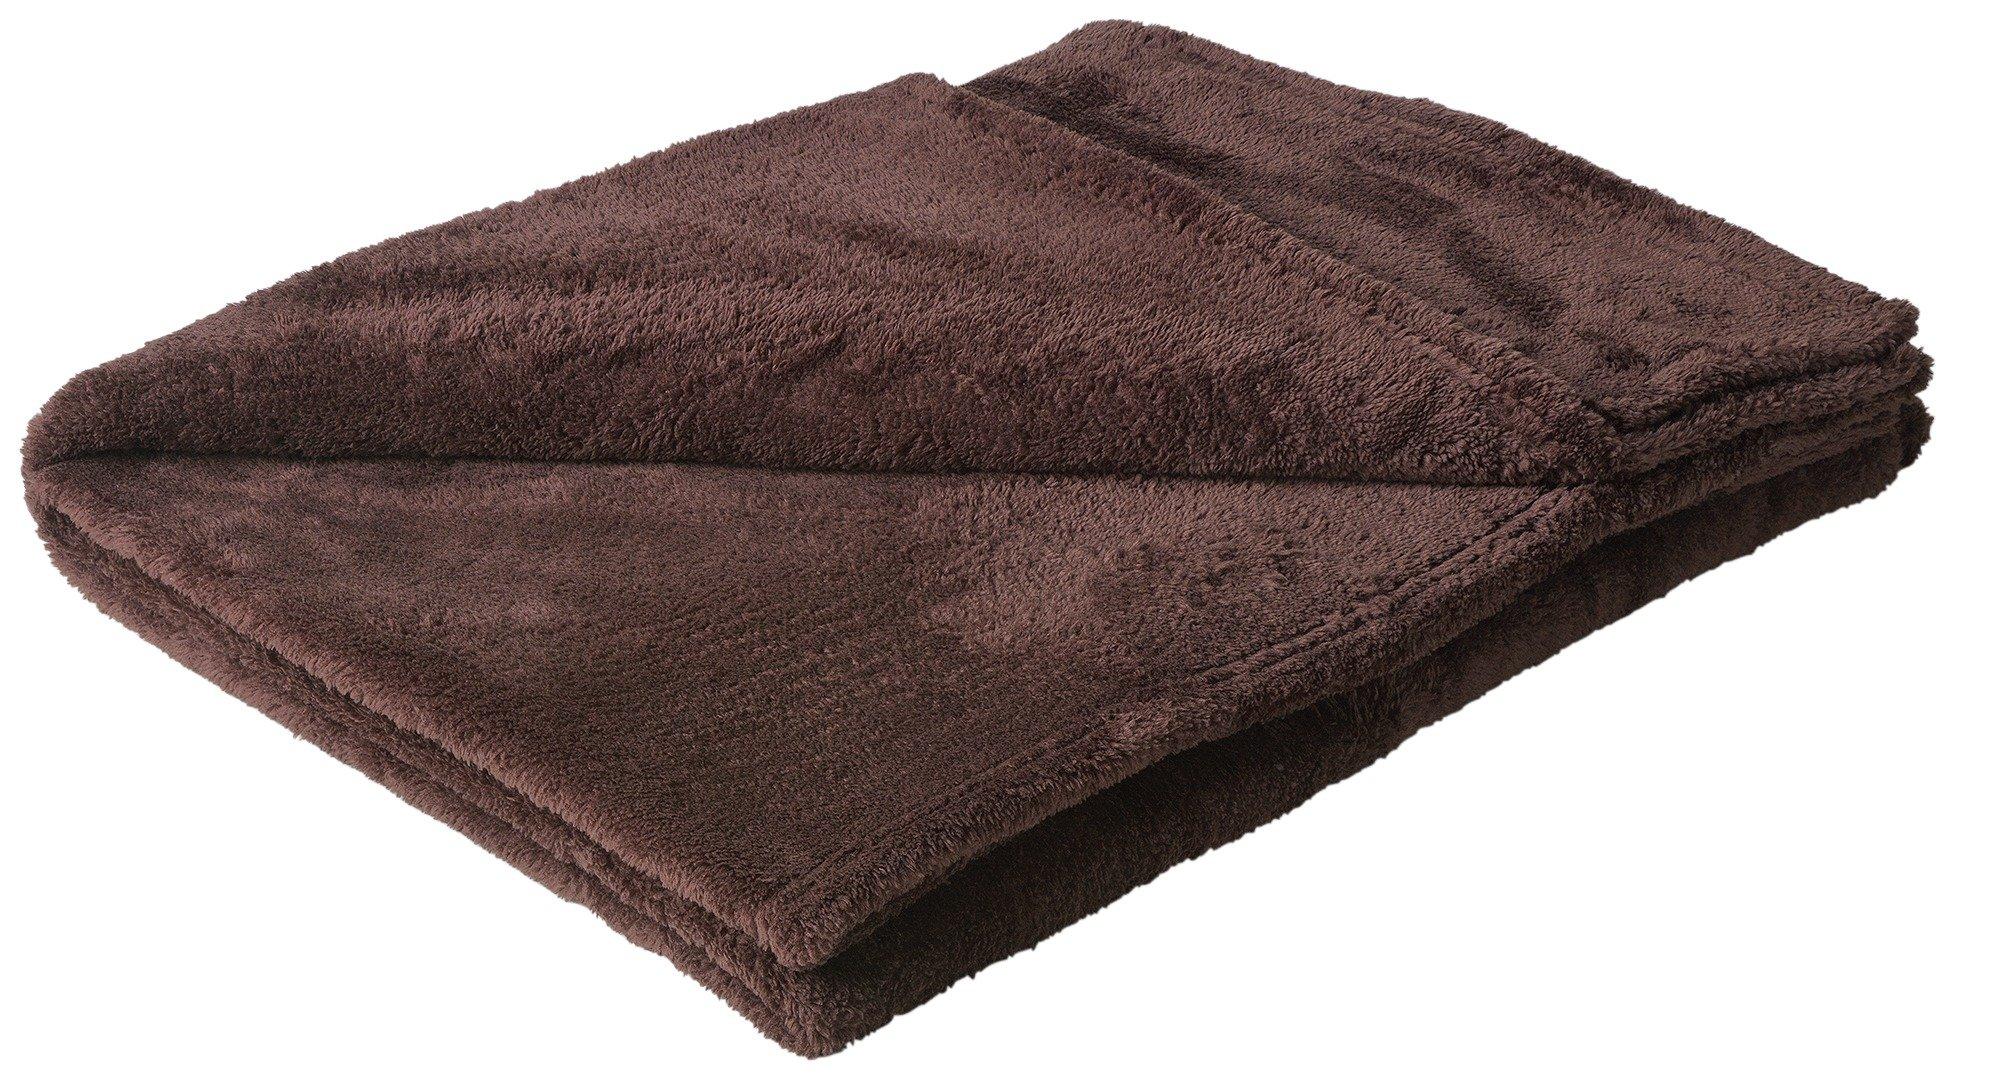 HOME Soft Fleece Throw - Chocolate